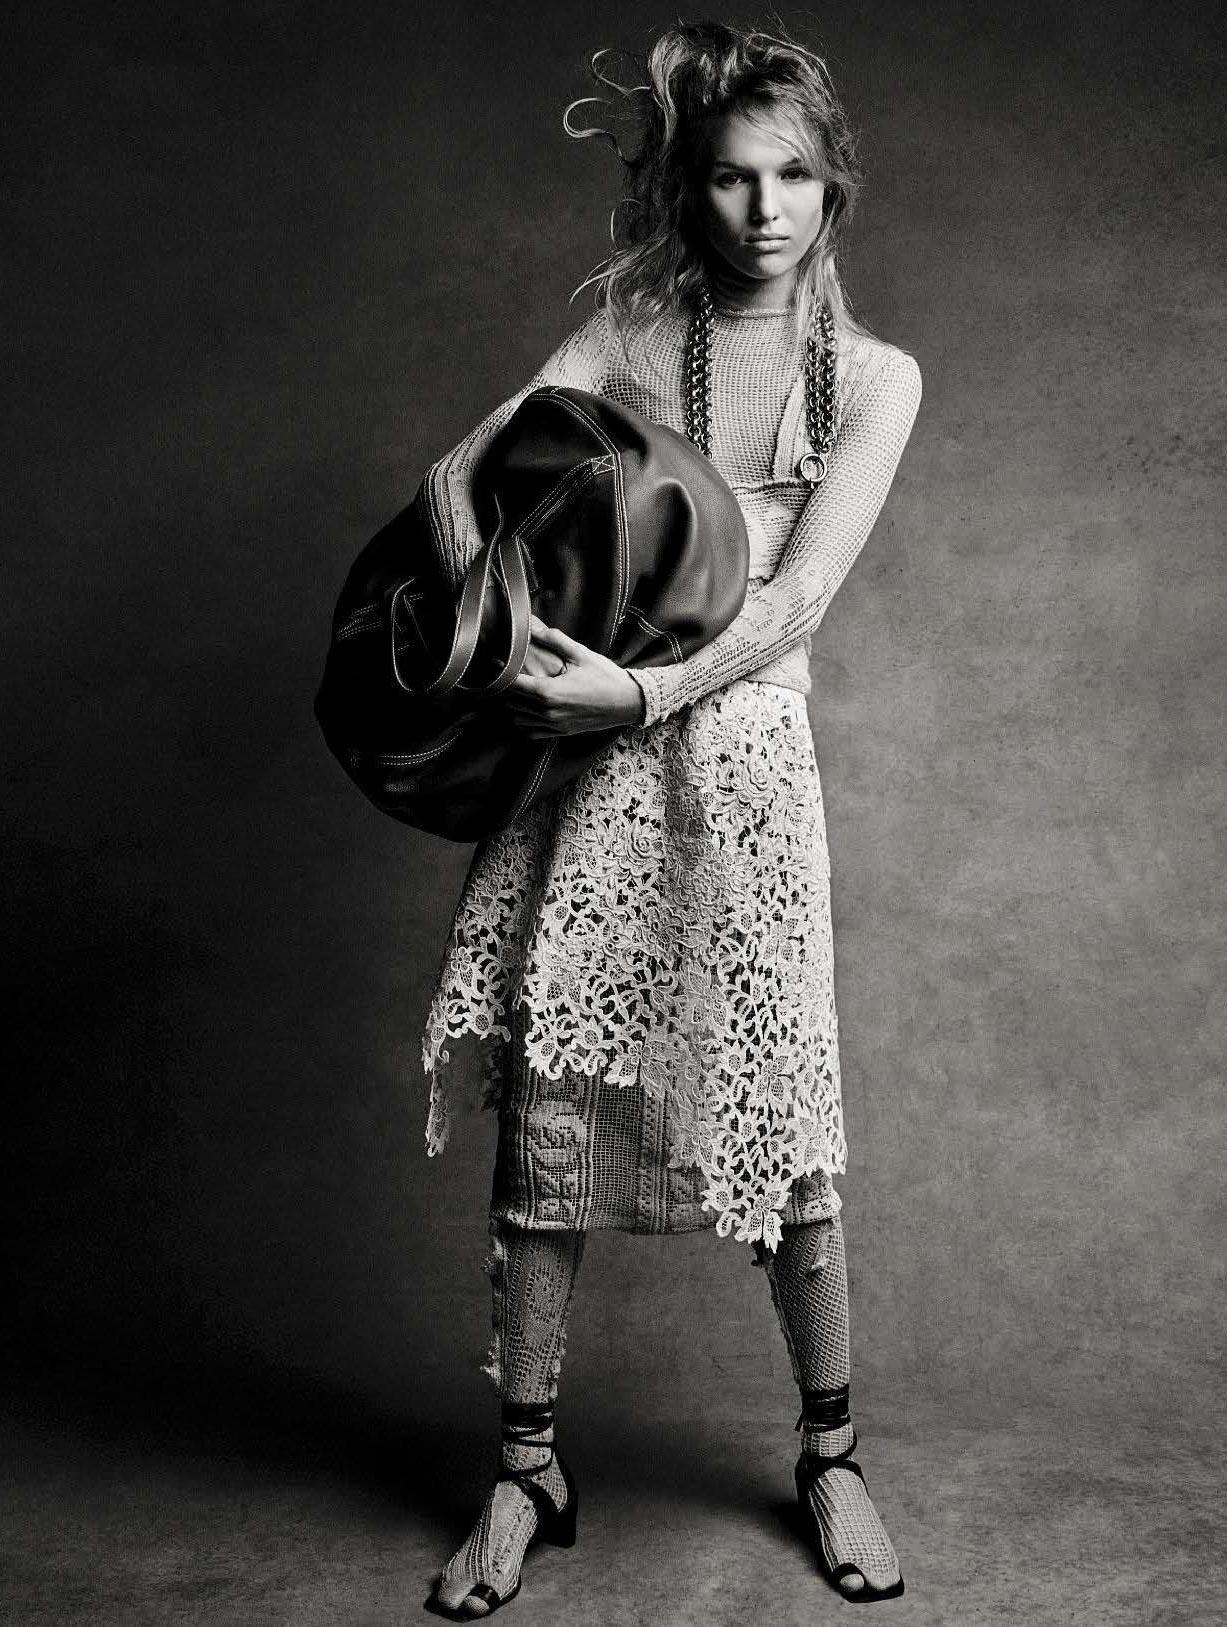 Новое поколение супермоделей / Jess PW by Patrick Demarchelier - Vogue Italia january 2017